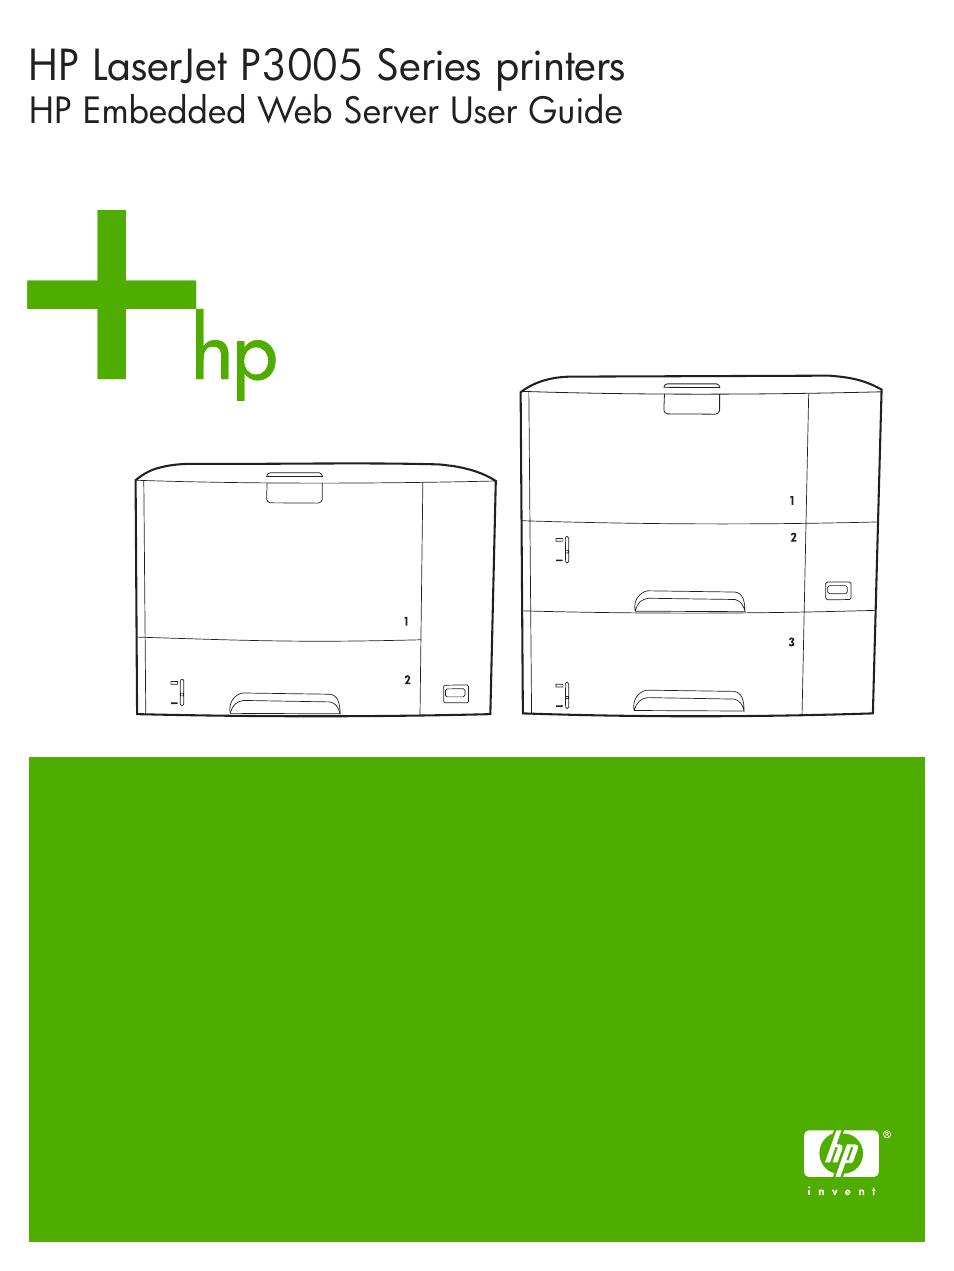 hp laserjet p3005 printer series user manual 58 pages rh manualsdir com HP LaserJet 4350 Driver HP LaserJet P3005 Printer